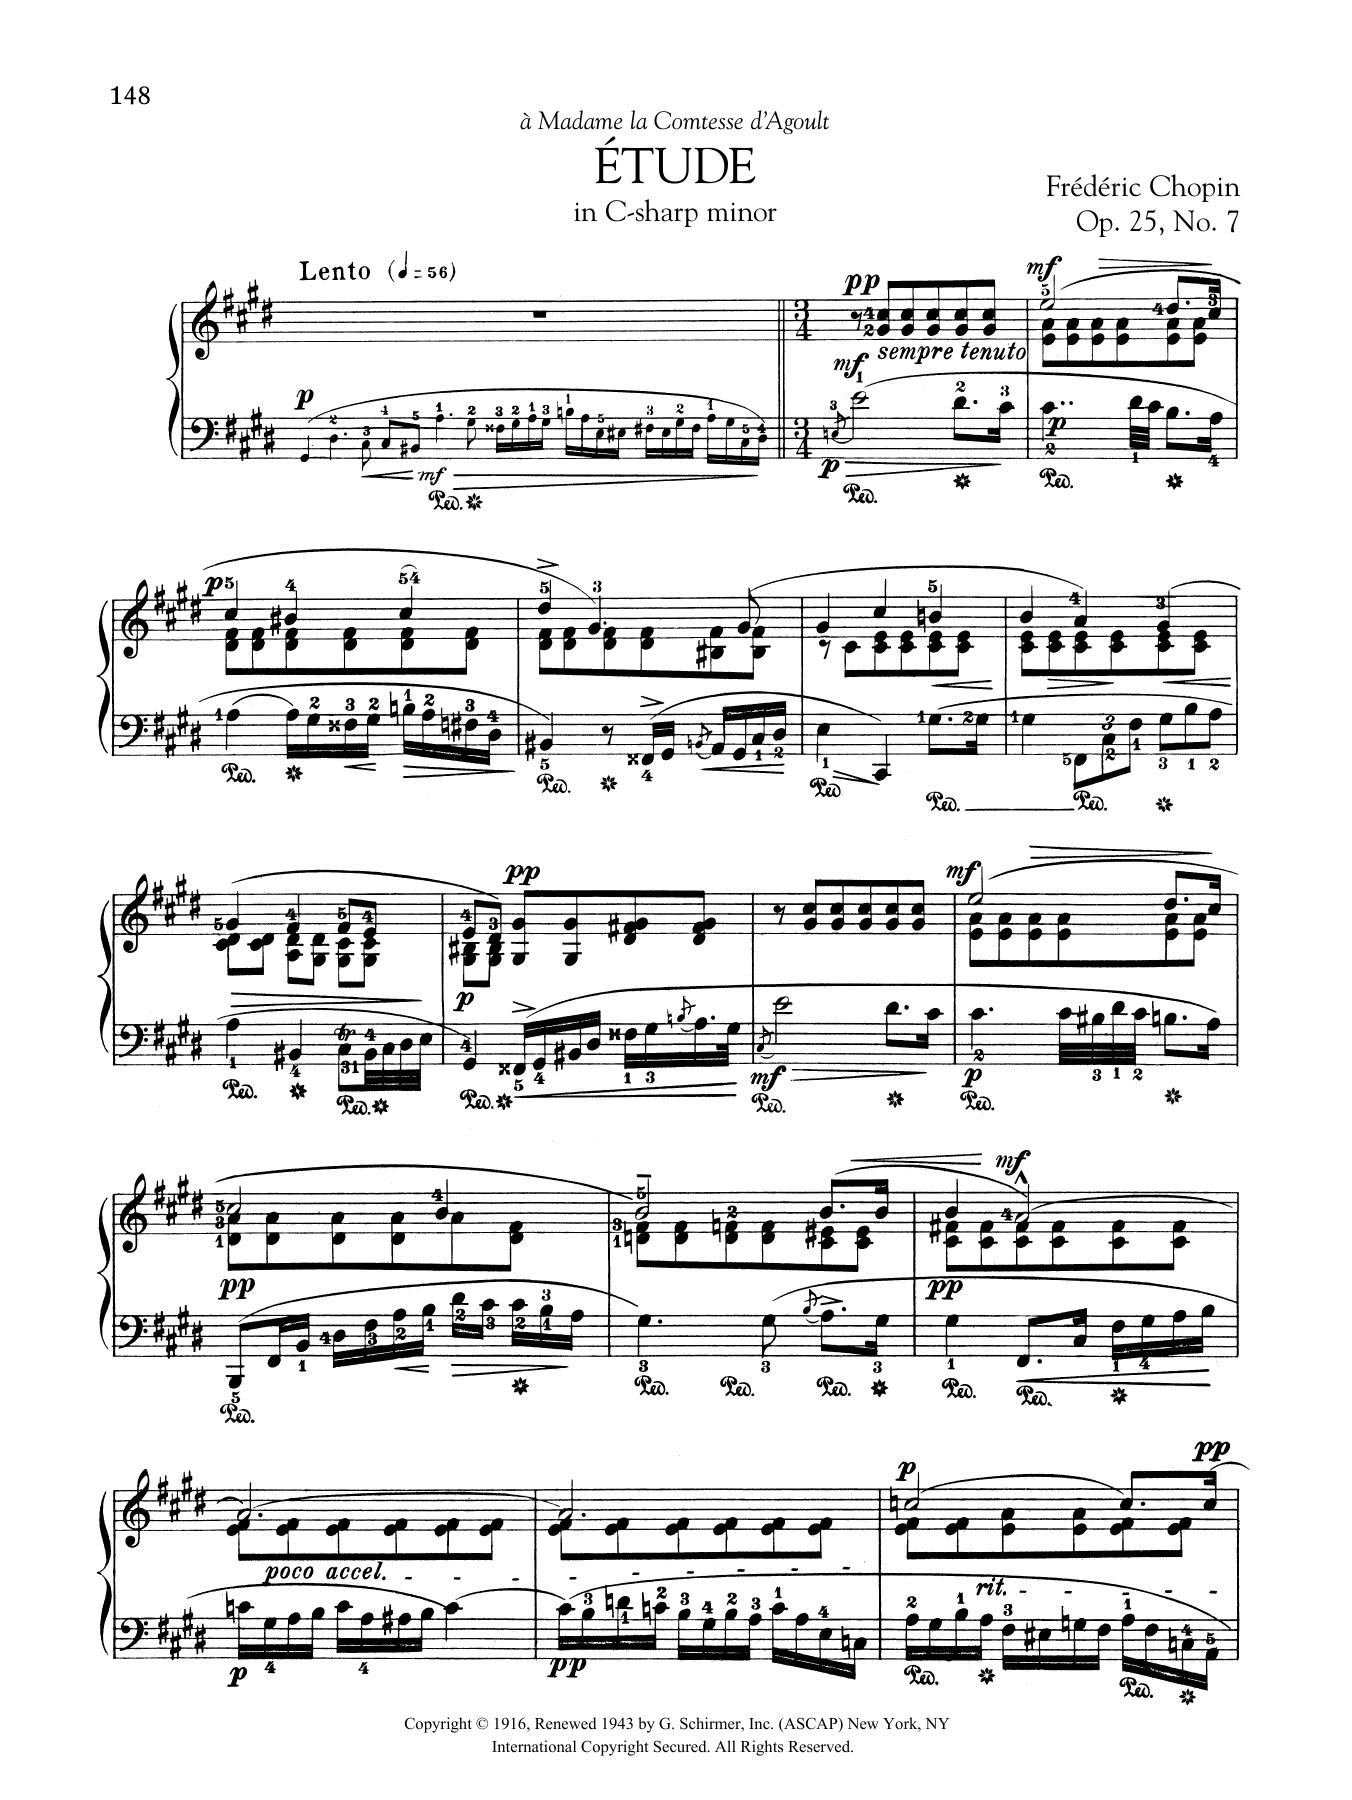 Etude in C-sharp minor, Op. 25, No. 7 Sheet Music